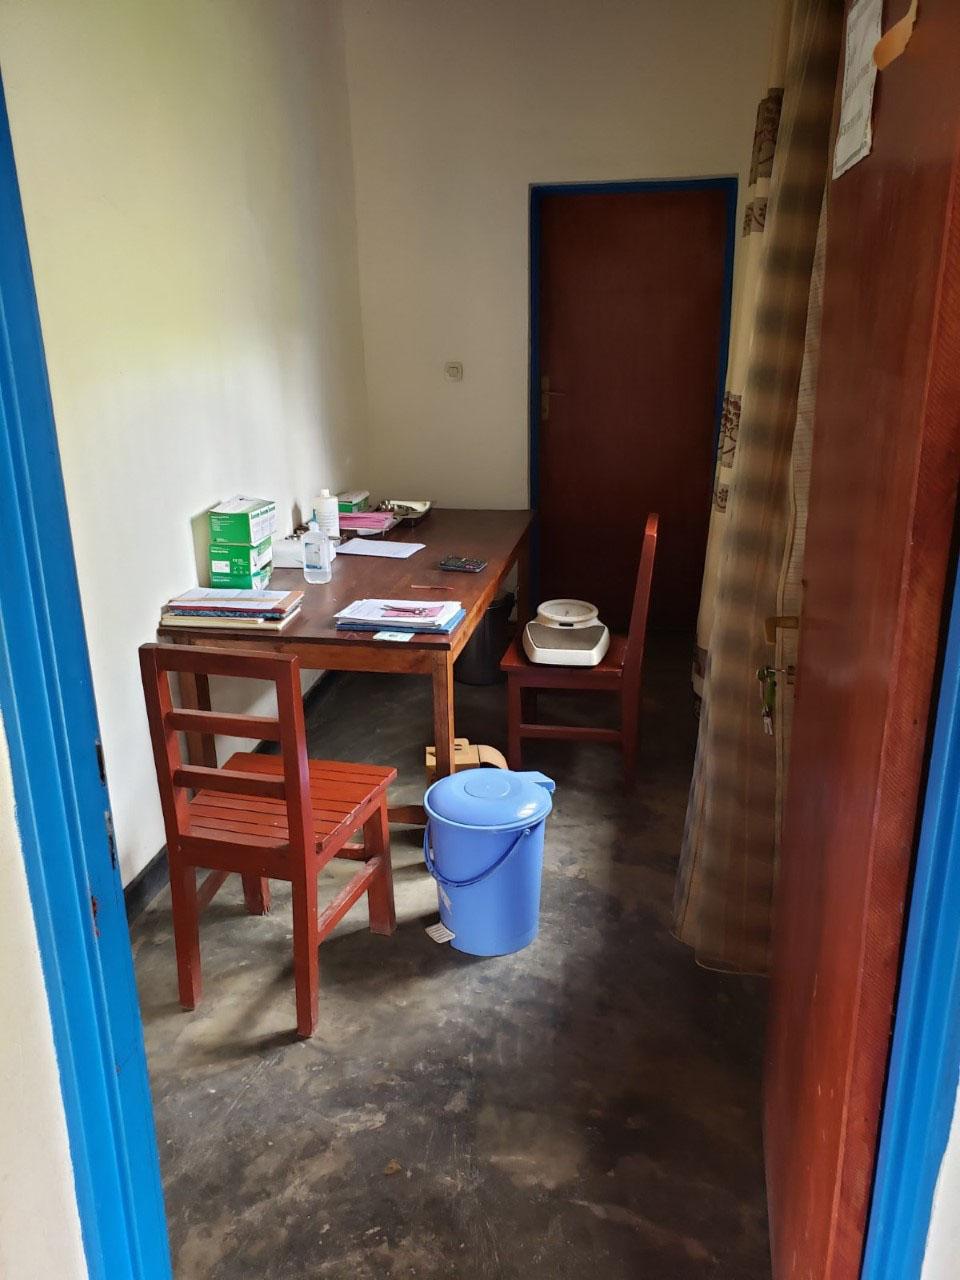 The consultation room at the Kiruhura Parish's health post in the District of Gicumbi.